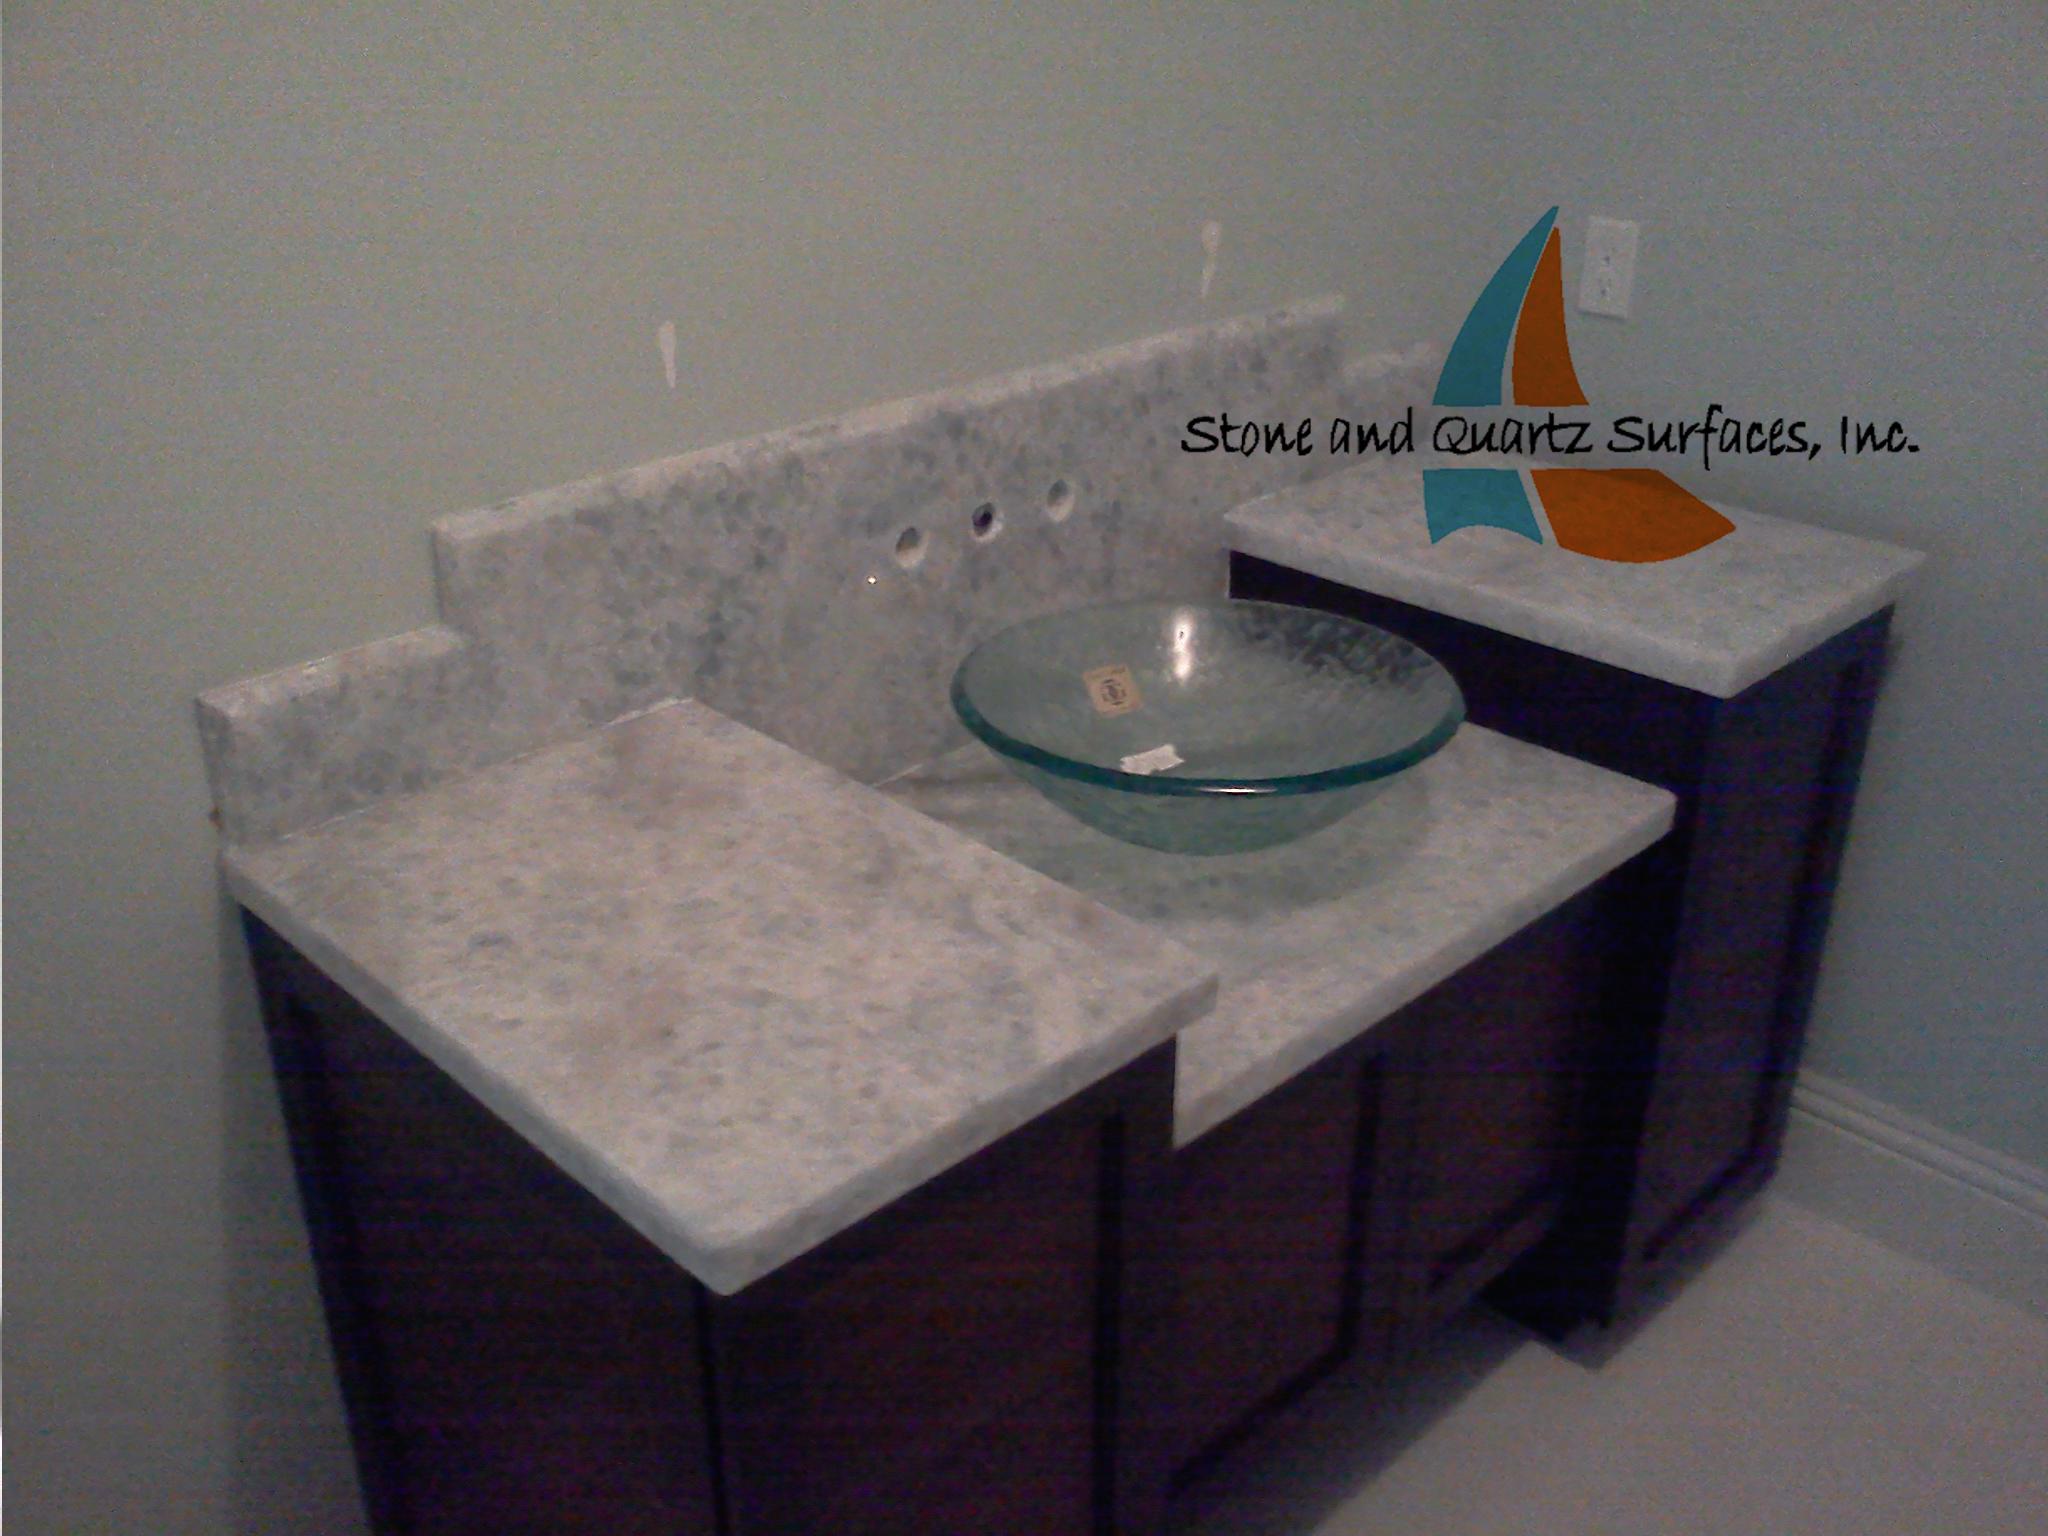 quartzite vanity top with a vessel